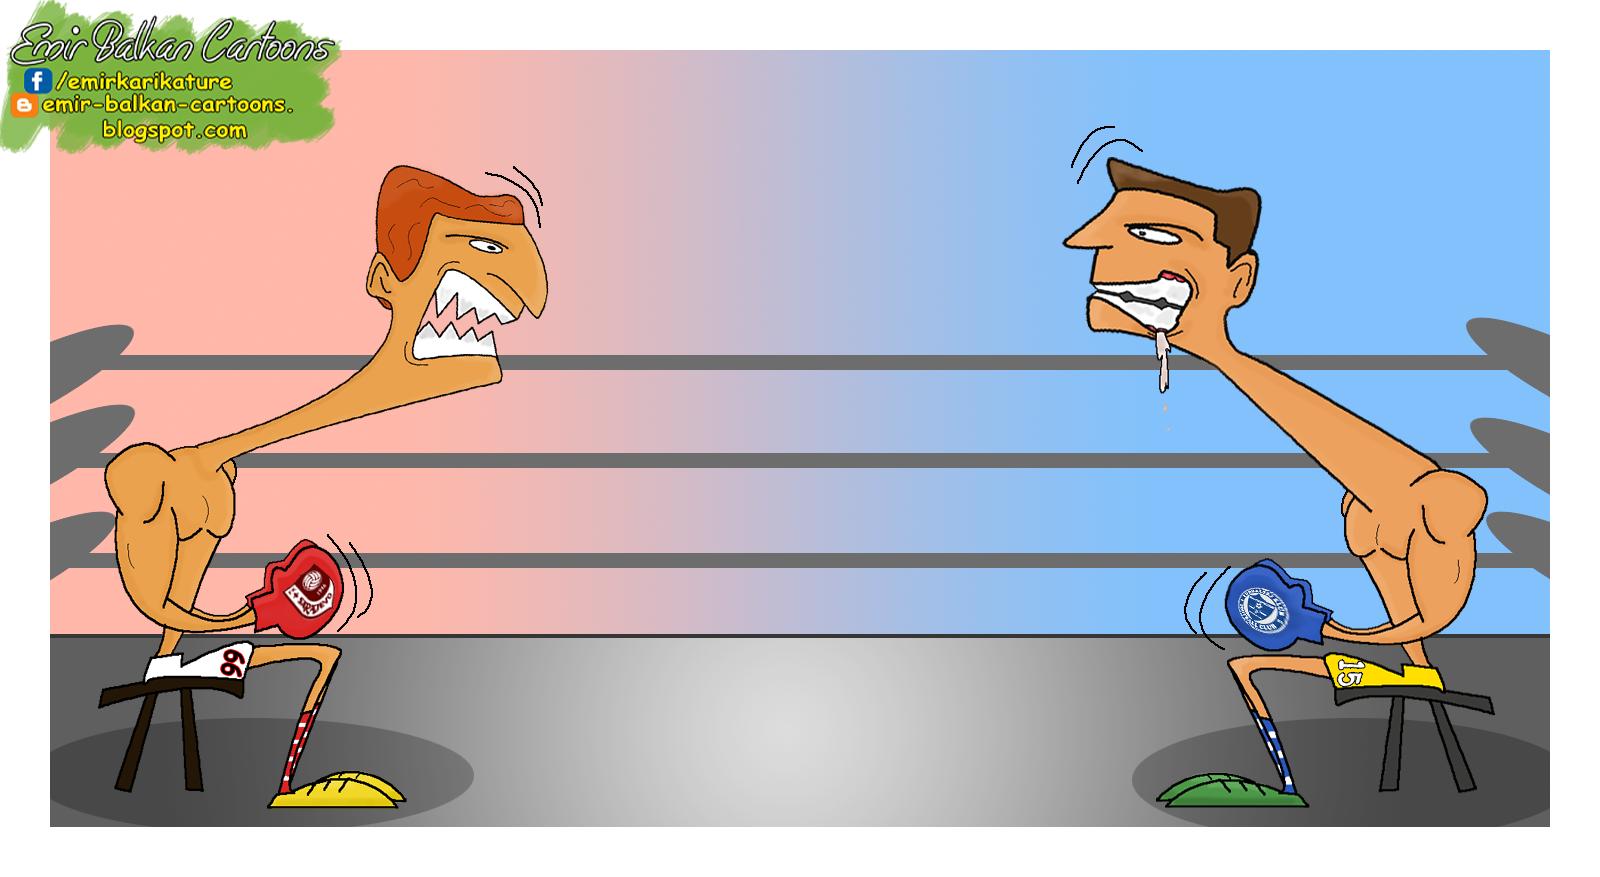 http://emir-balkan-cartoons.blogspot.com/